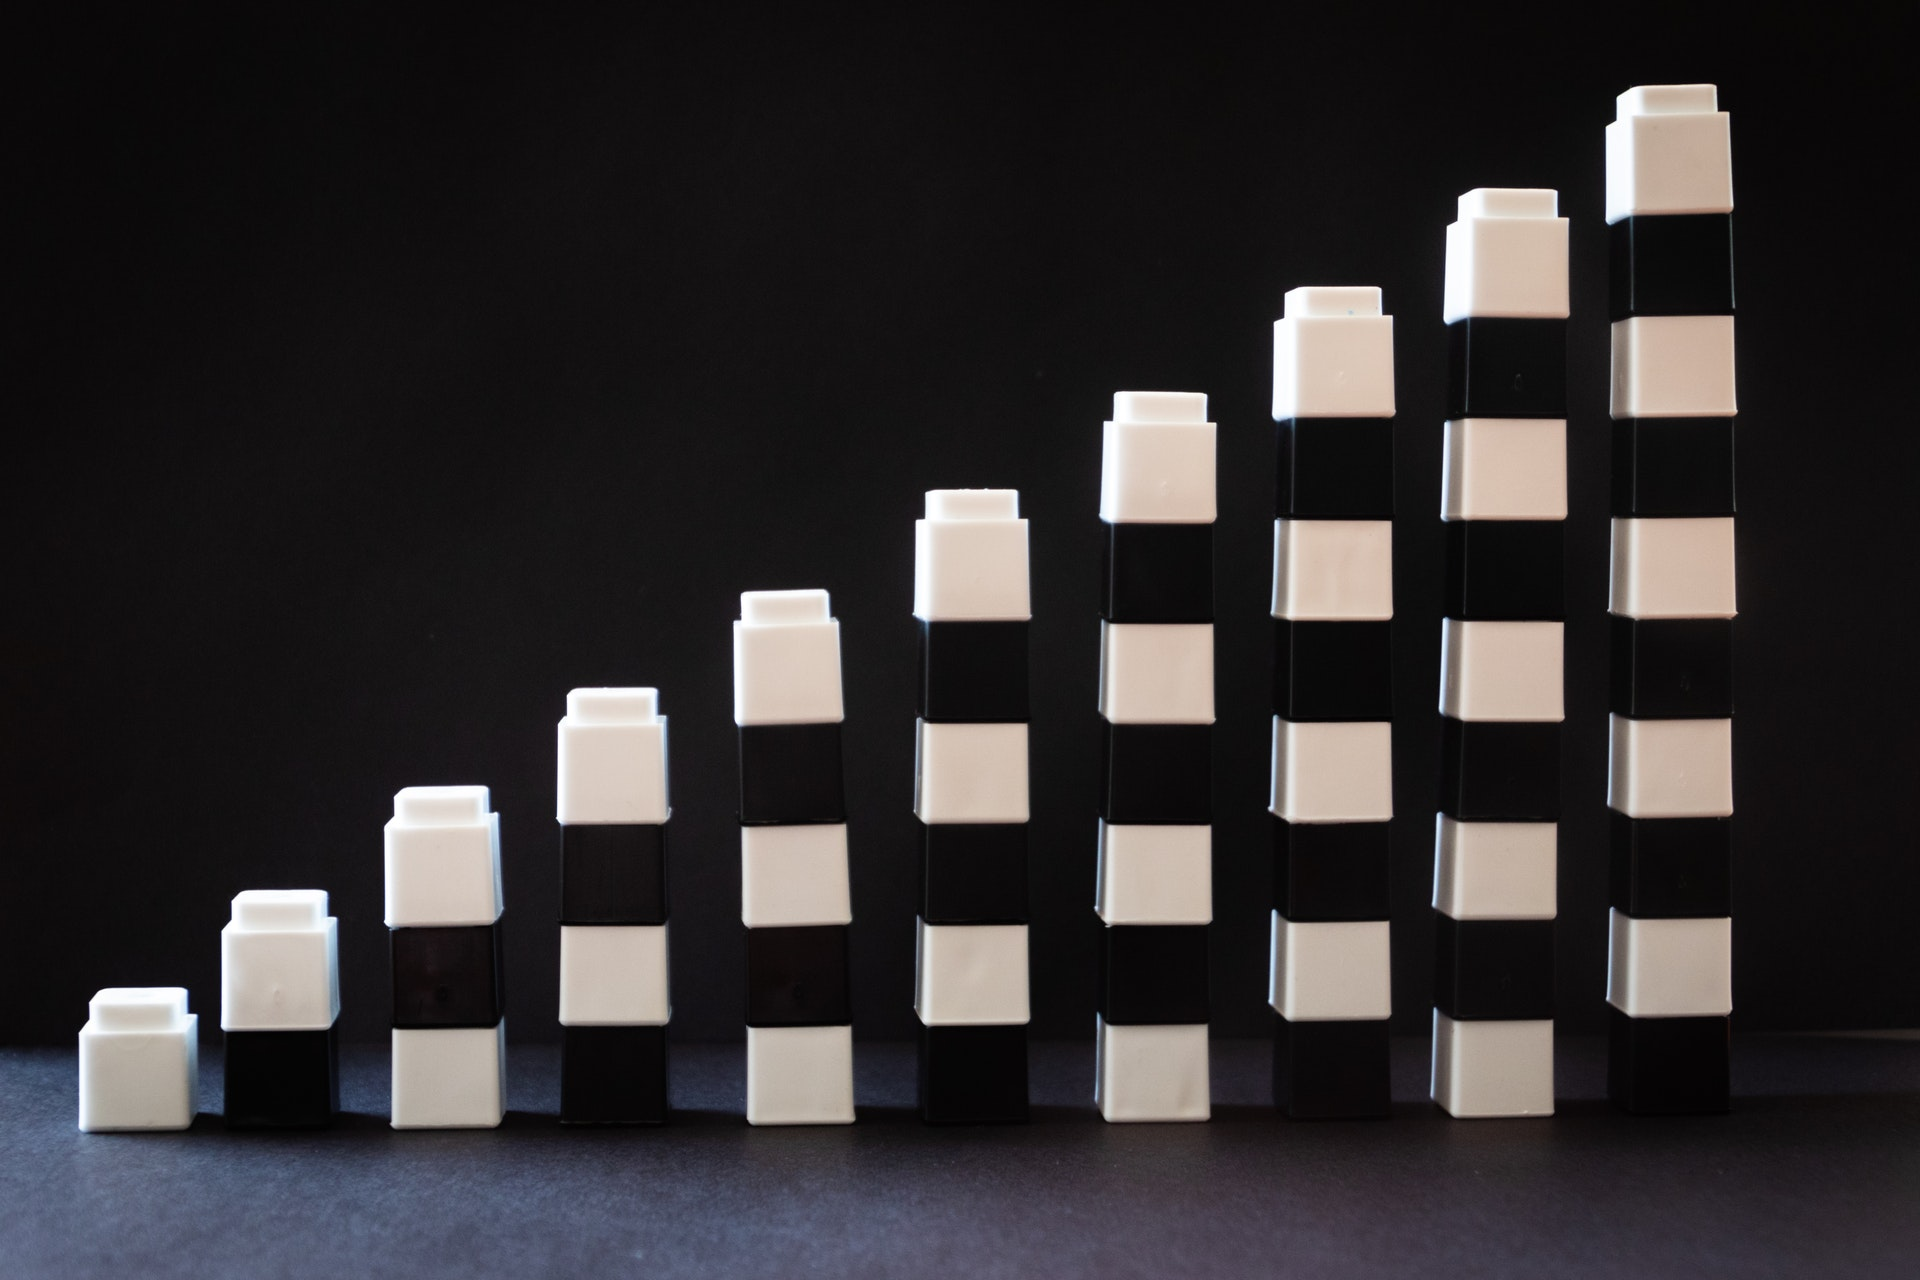 Towers of blocks